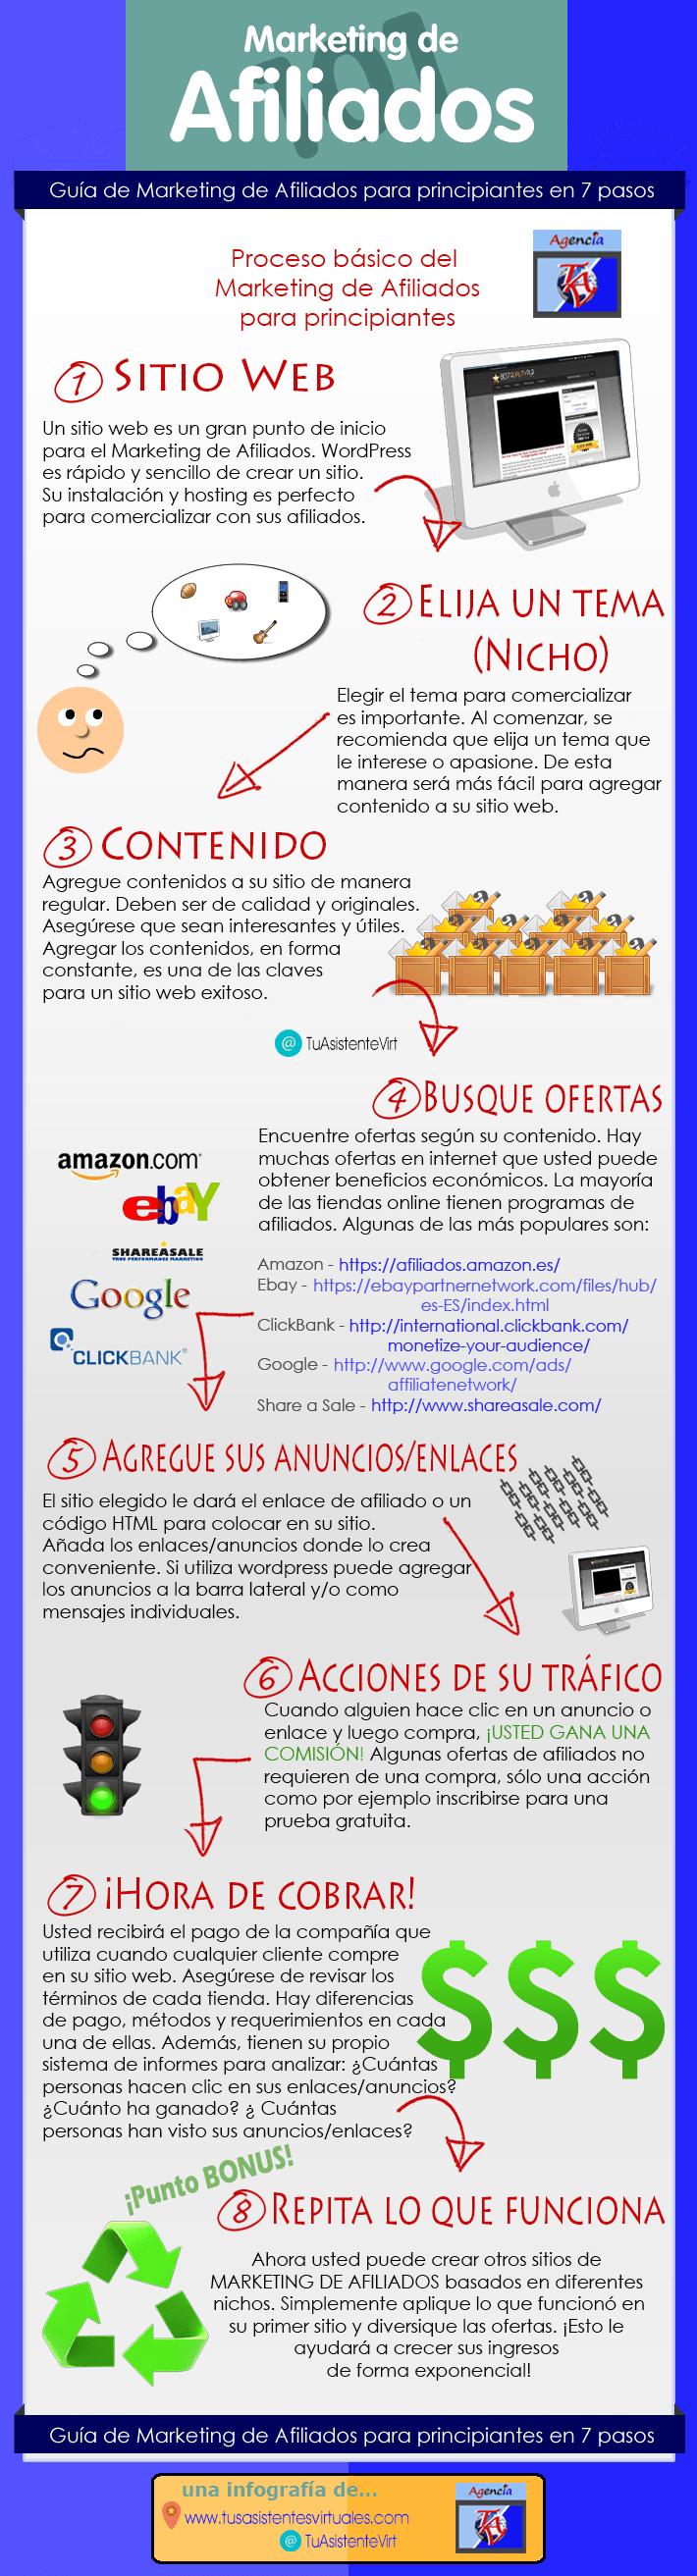 guia-de-implementacion-de-marketing-de-afiliacion-infografia-en-espanol